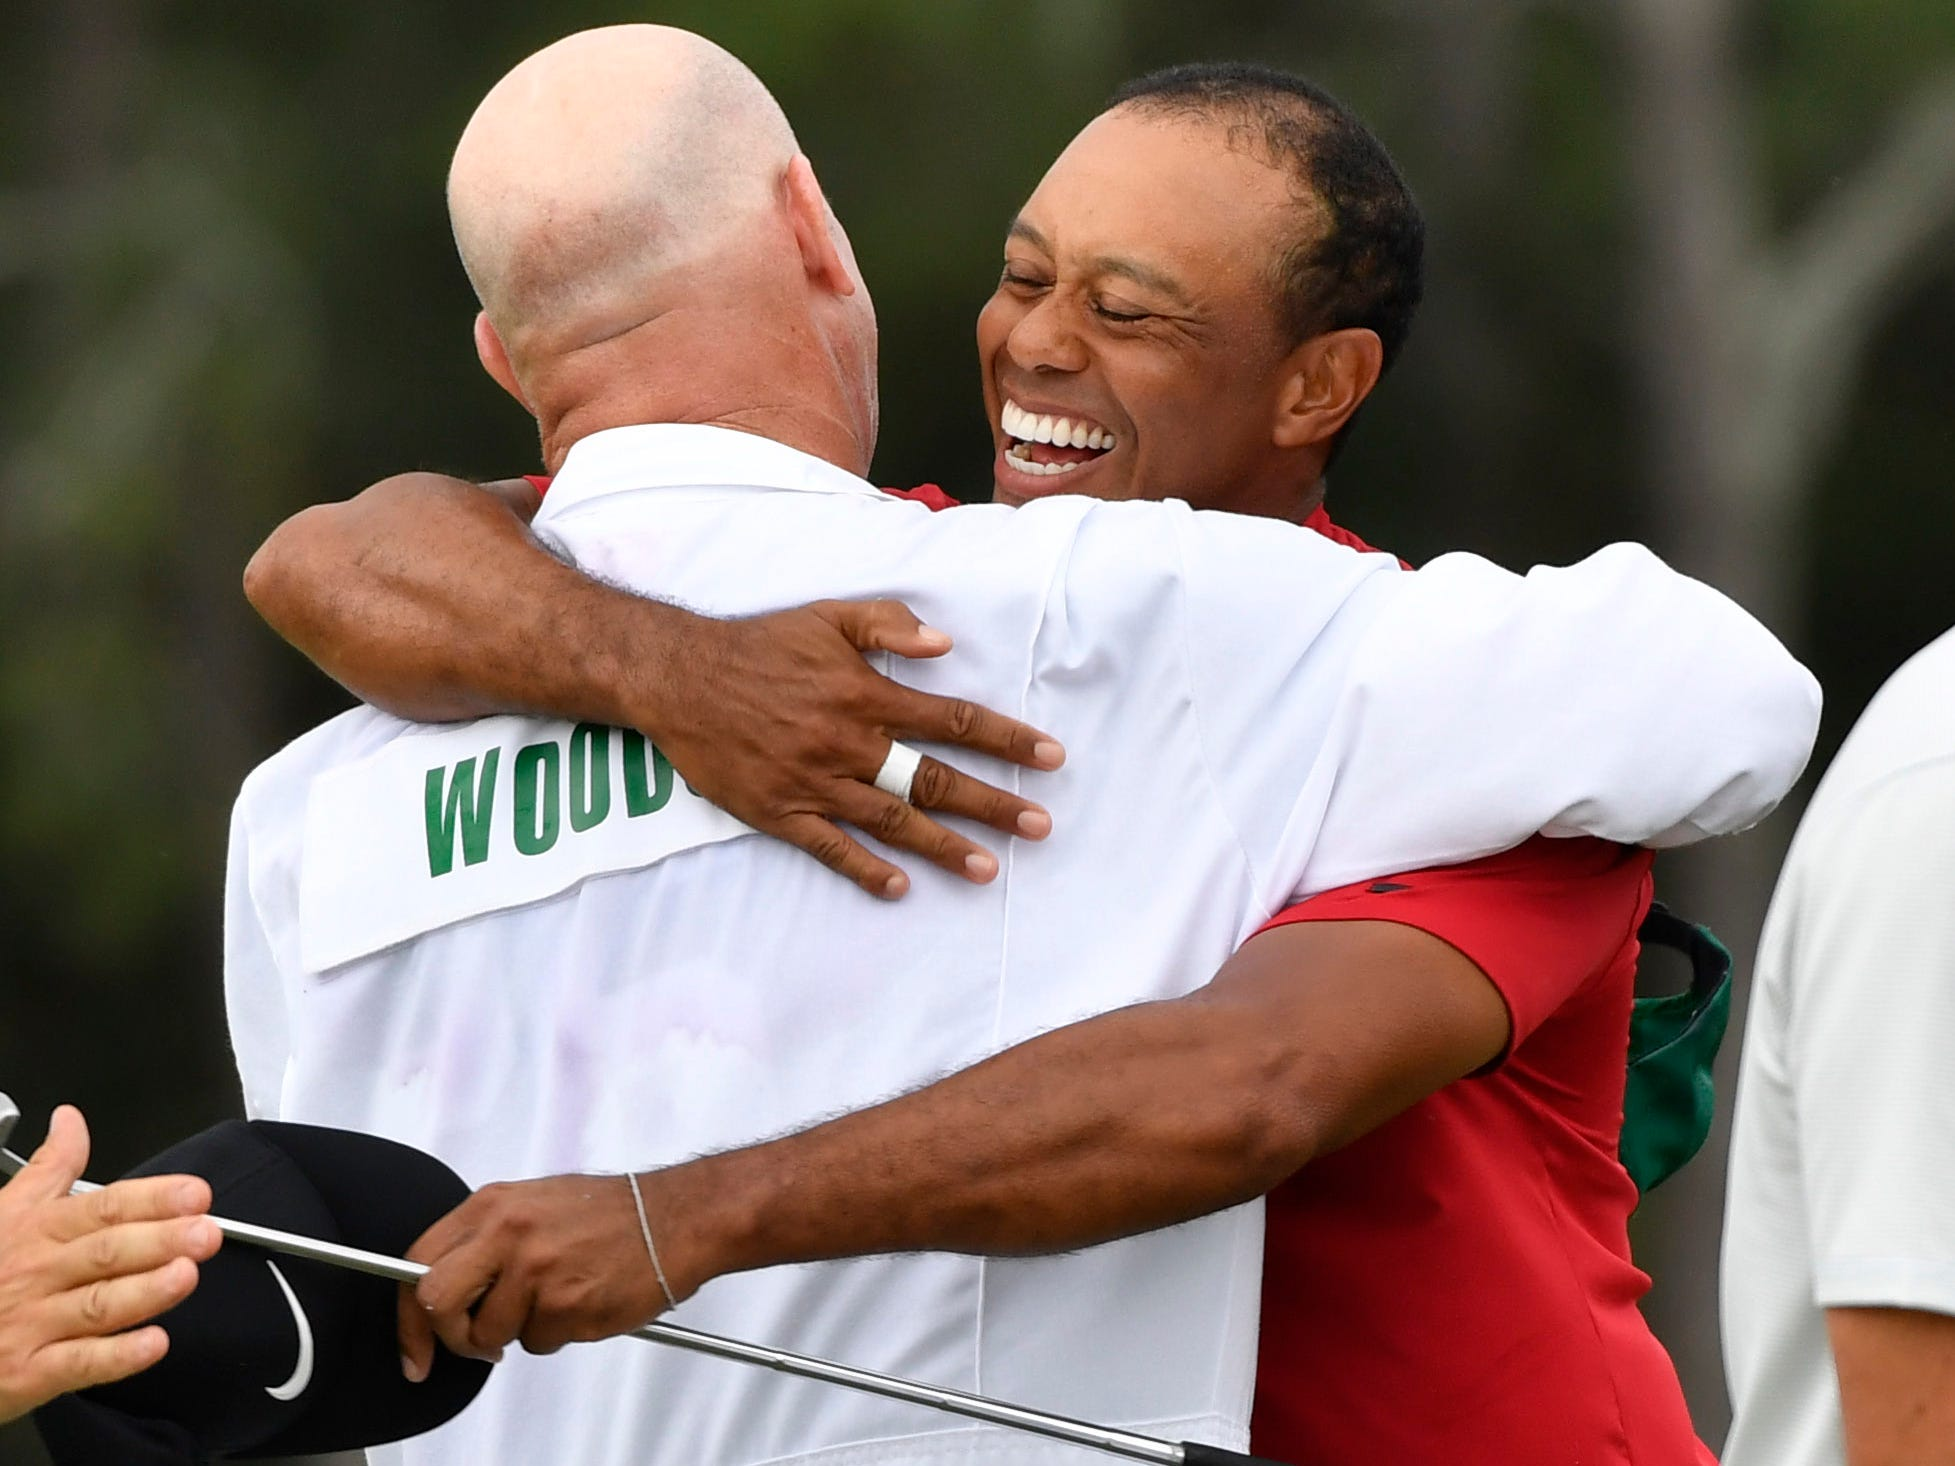 Apr 14, 2019; Augusta, GA, USA; Tiger Woods hugs caddie Joe Lacava after winning The Masters golf tournament at Augusta National Golf Club. Mandatory Credit: Michael Madrid-USA TODAY Sports ORG XMIT: USATSI-389786 ORIG FILE ID:  20190414_jla_mm1_225.jpg